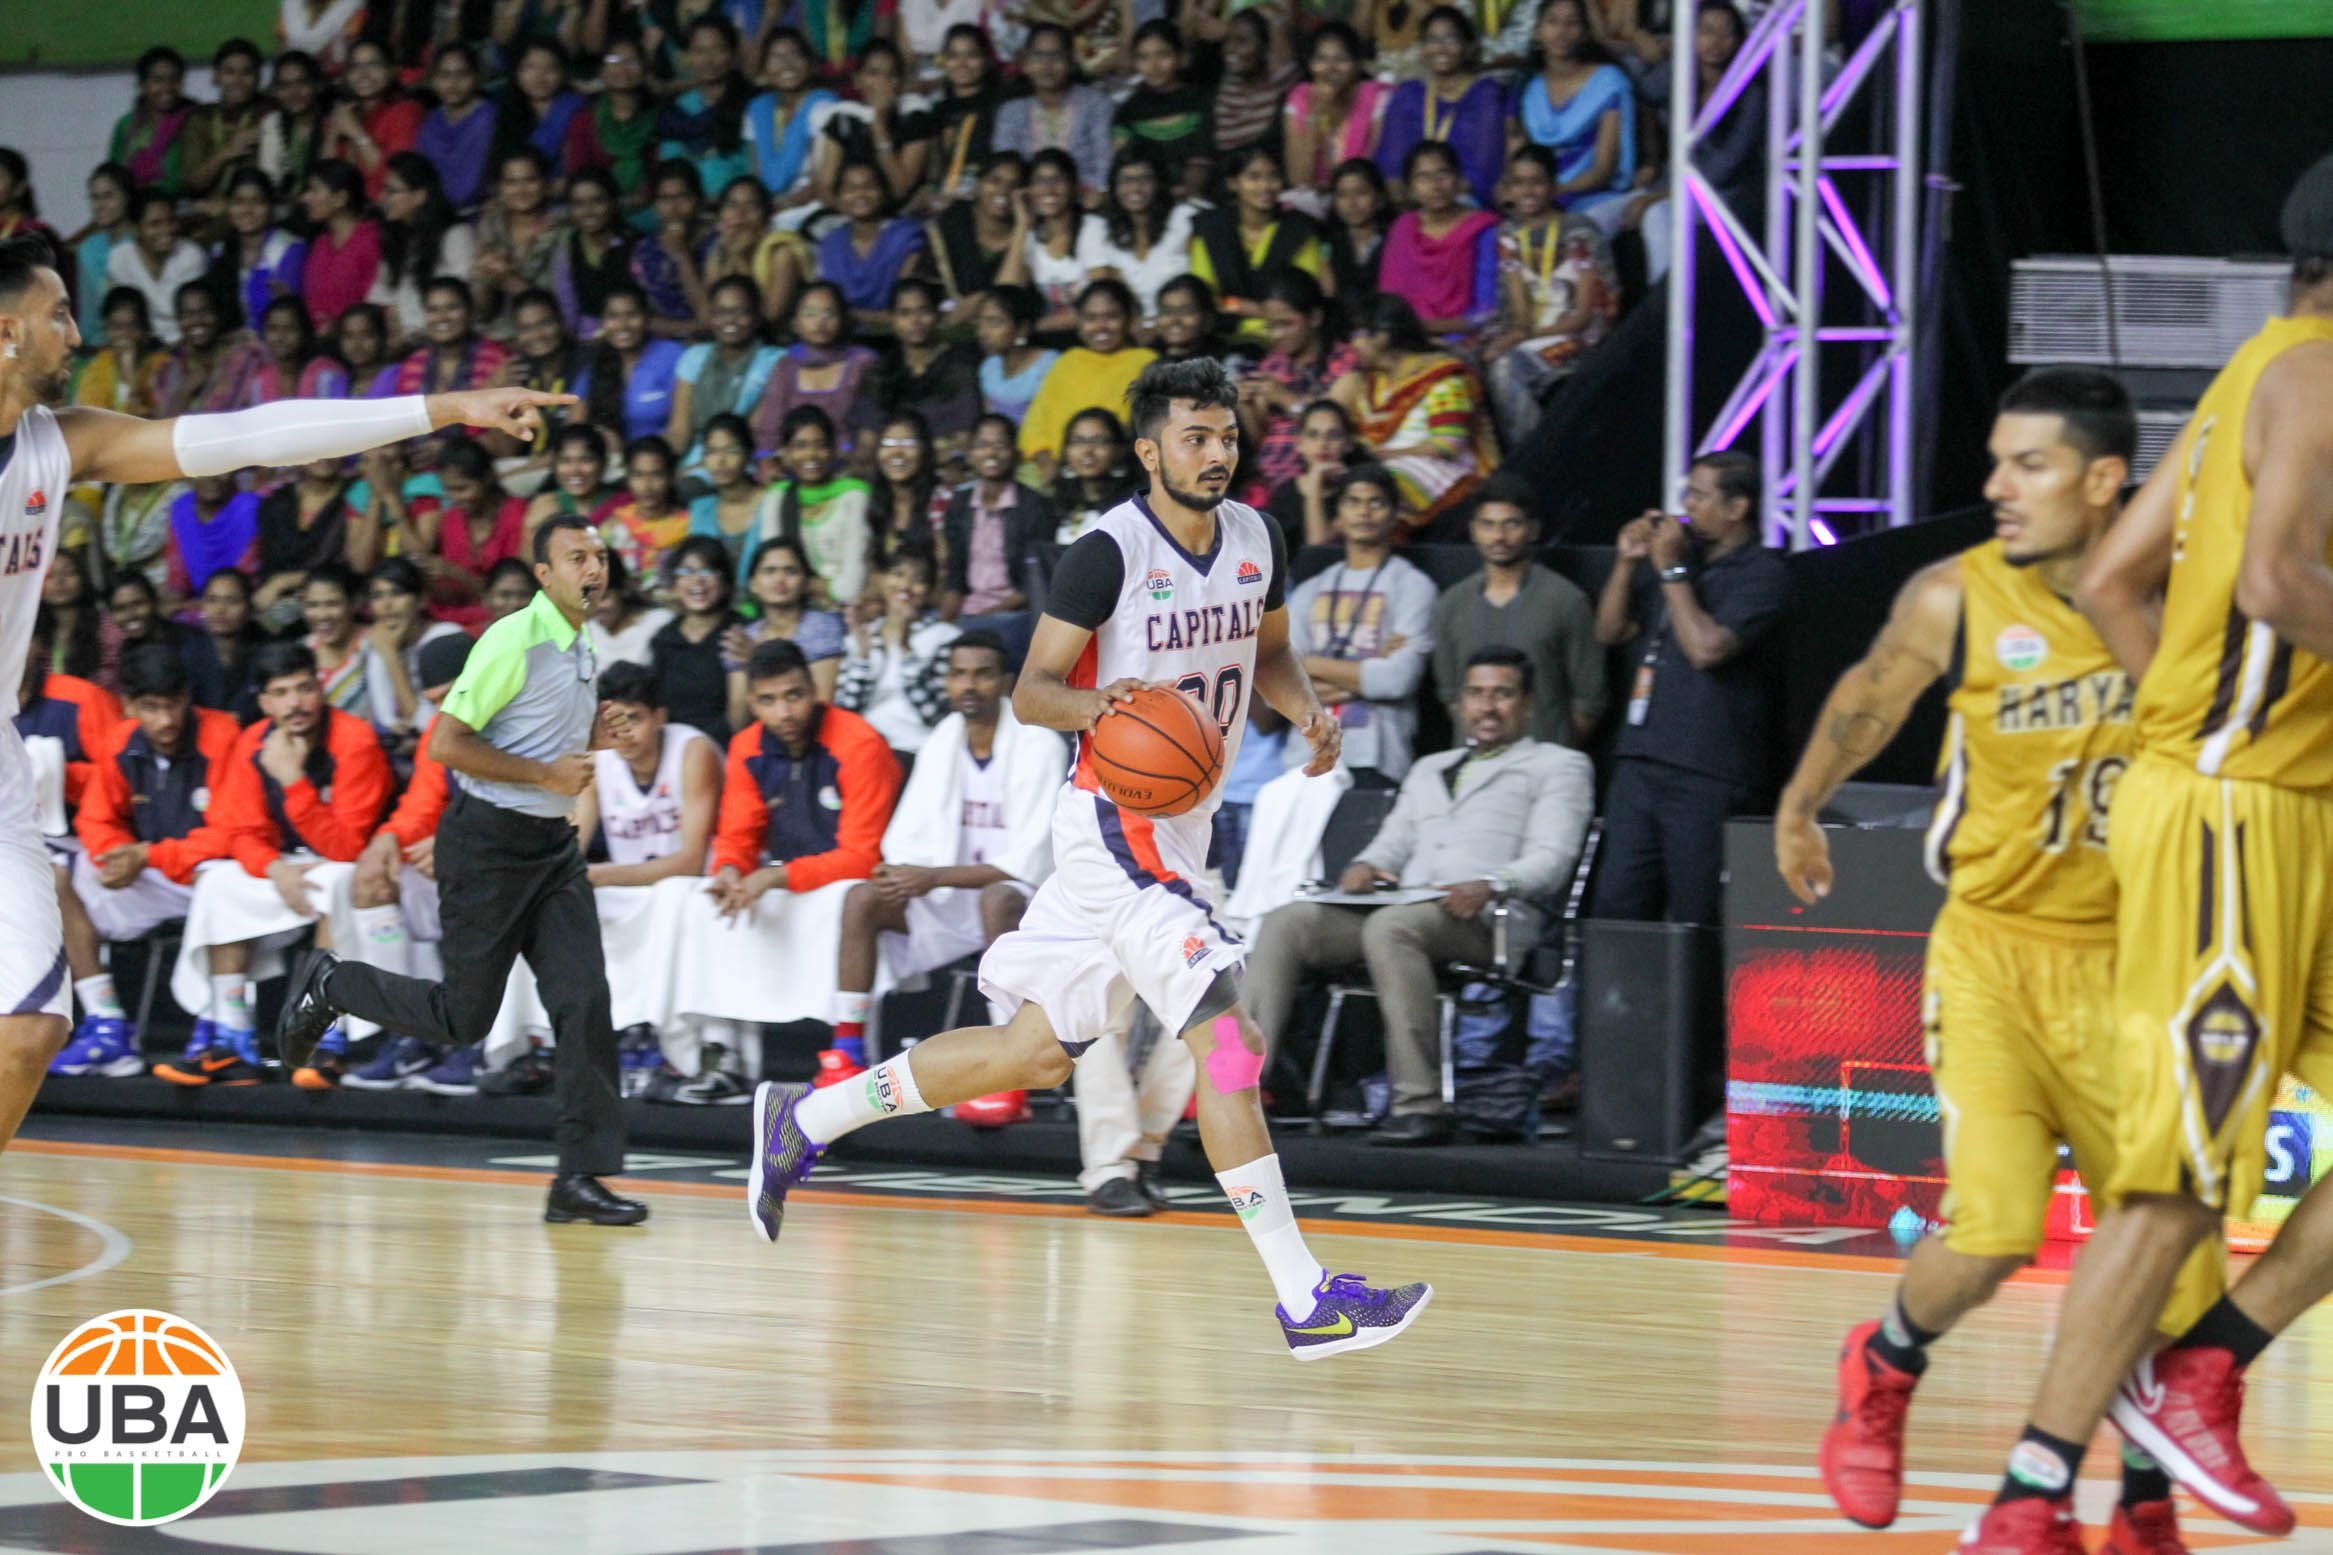 Before The Defense Has A Chance To Settle Vinay Kaushik Looks To Create An Opening Ubaindia Ubaseason4 With Images Basketball Teams Basketball Court Season 4